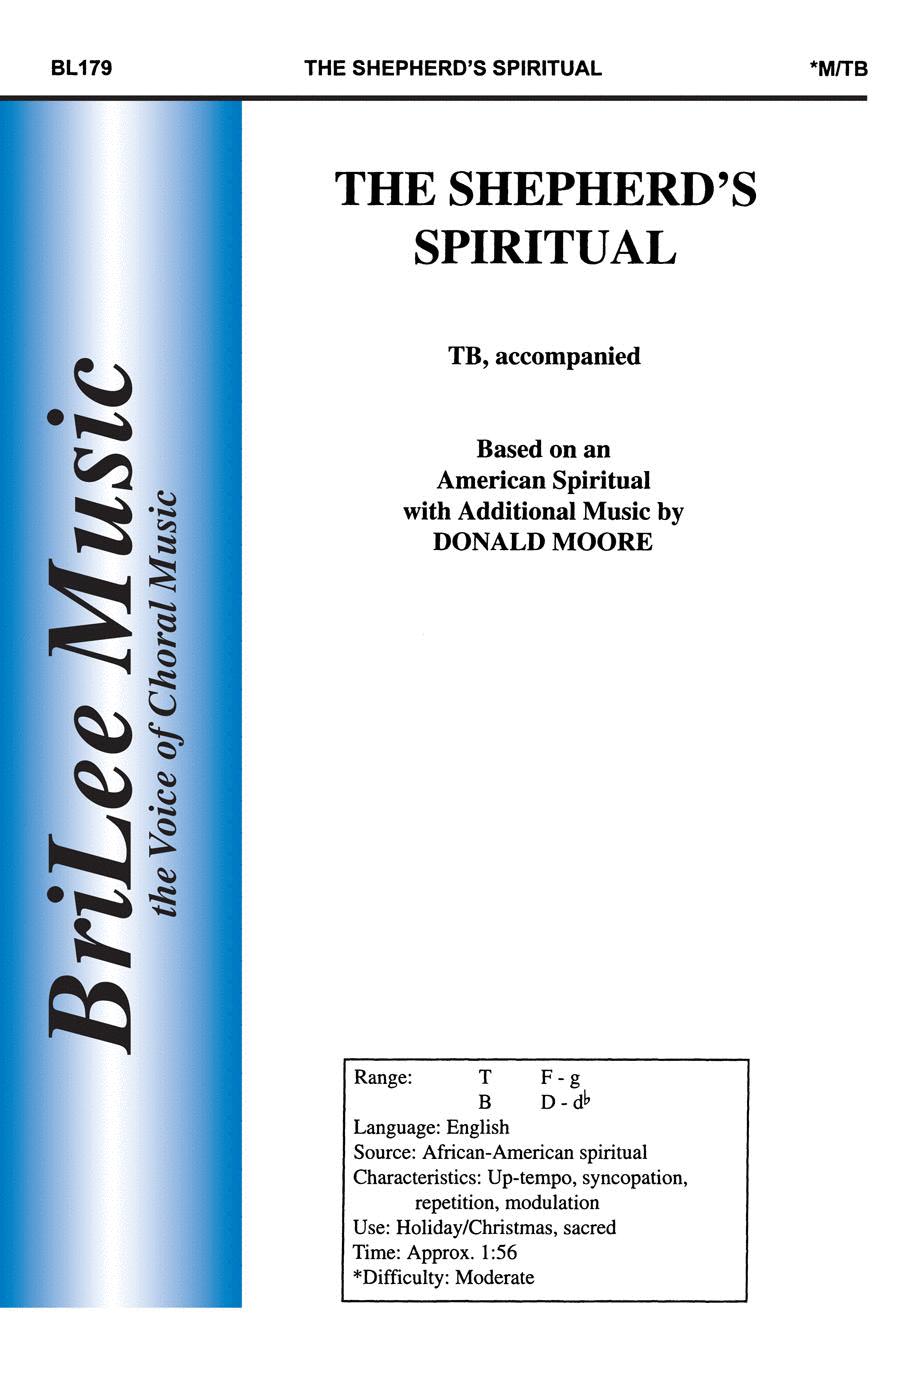 Shepherd's Spiritual